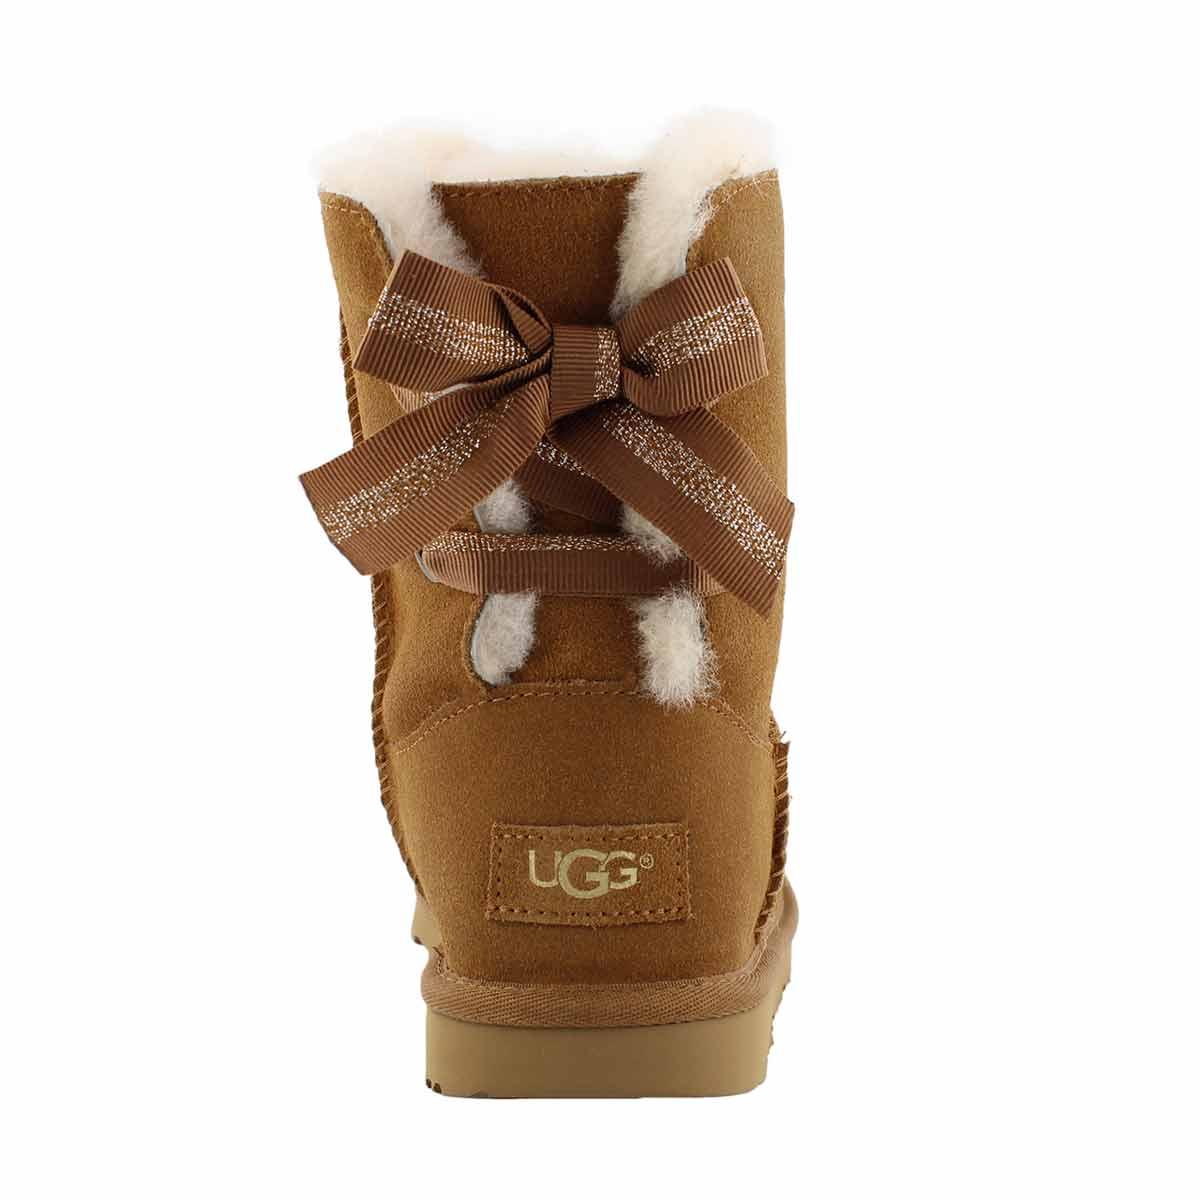 Grls Custom BaileyBow II che shpskn boot